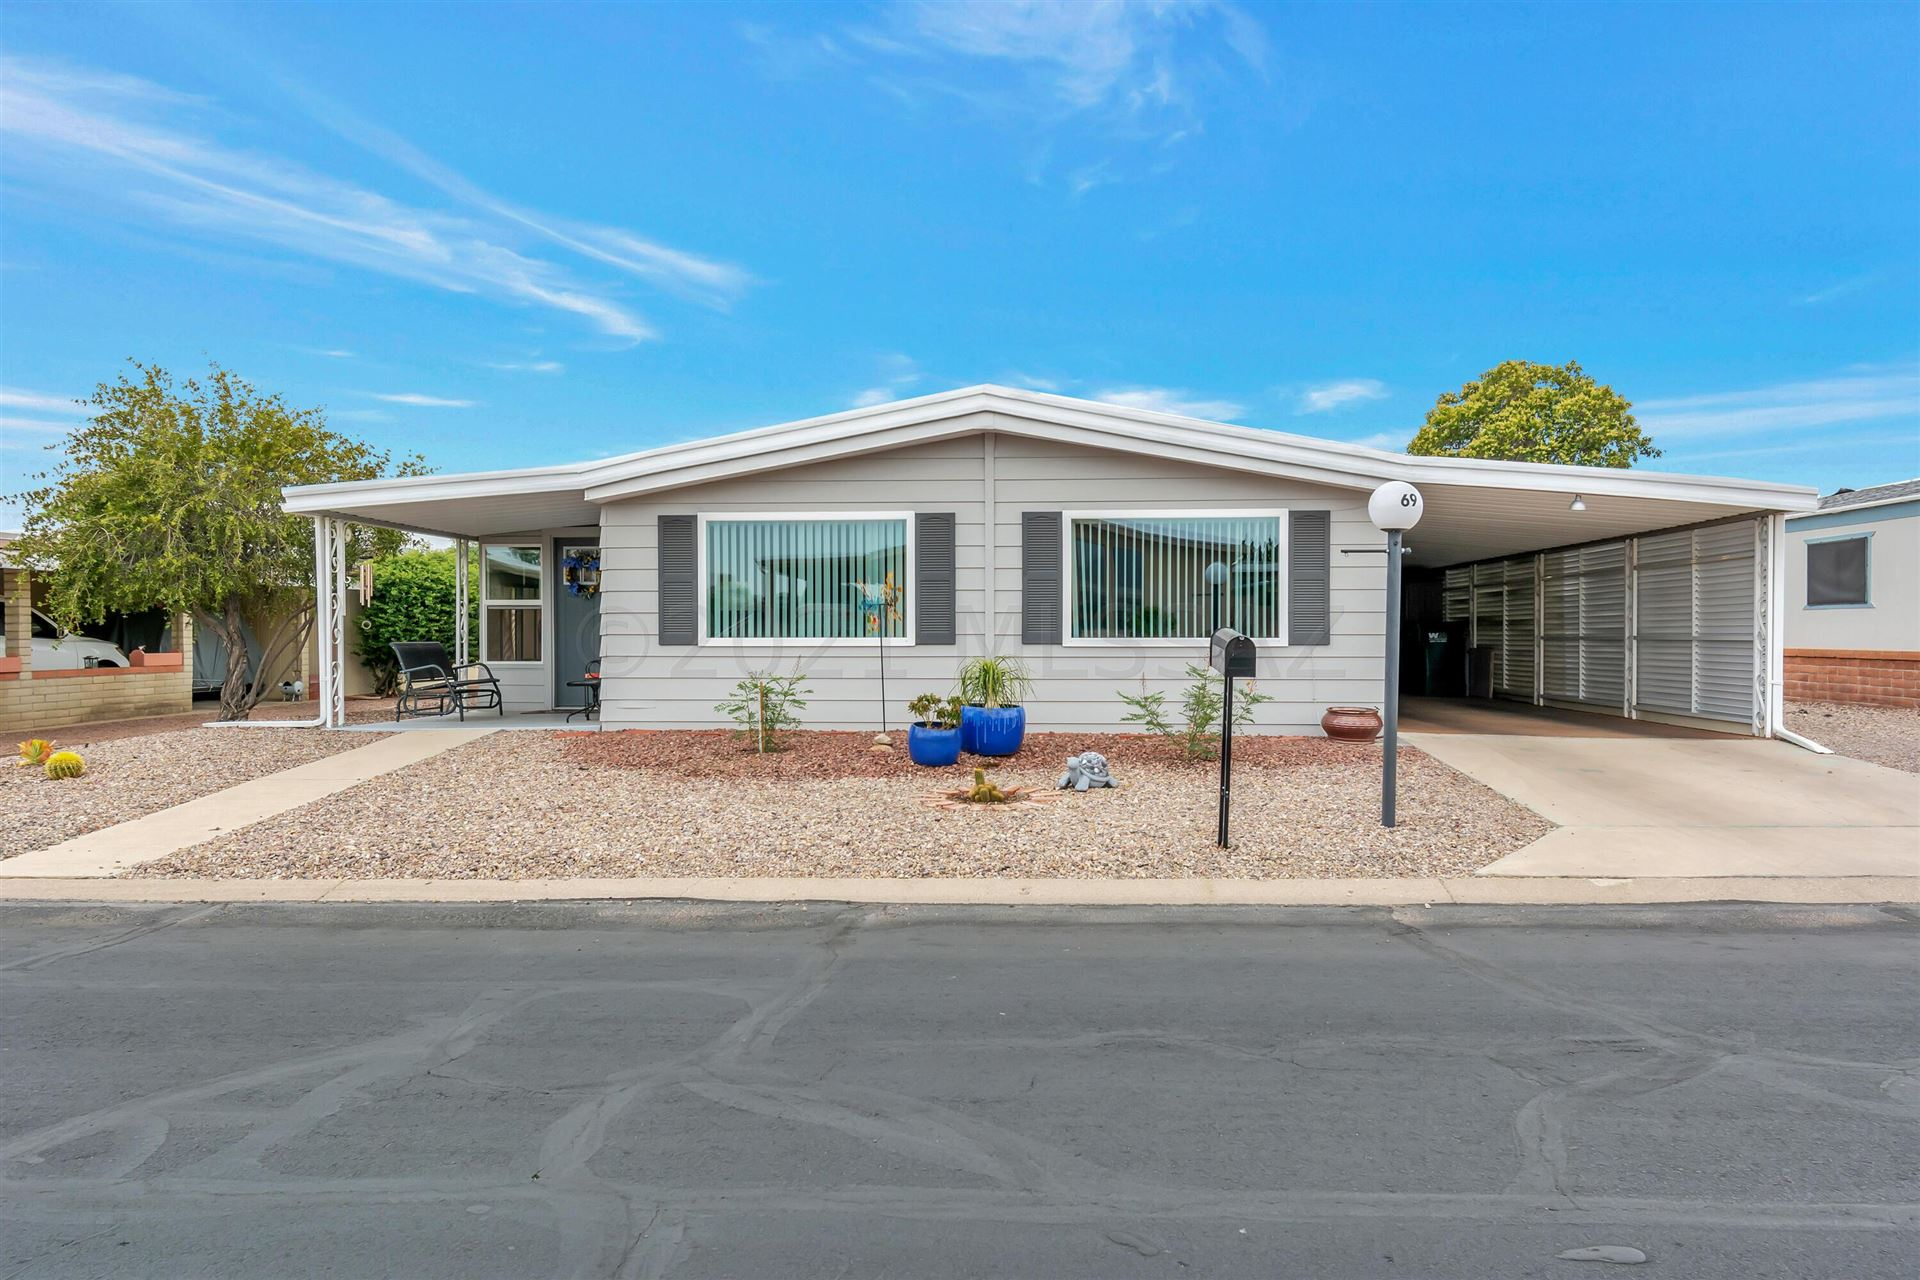 69 W Cedro Drive, Green Valley, AZ 85614 - MLS#: 22115562